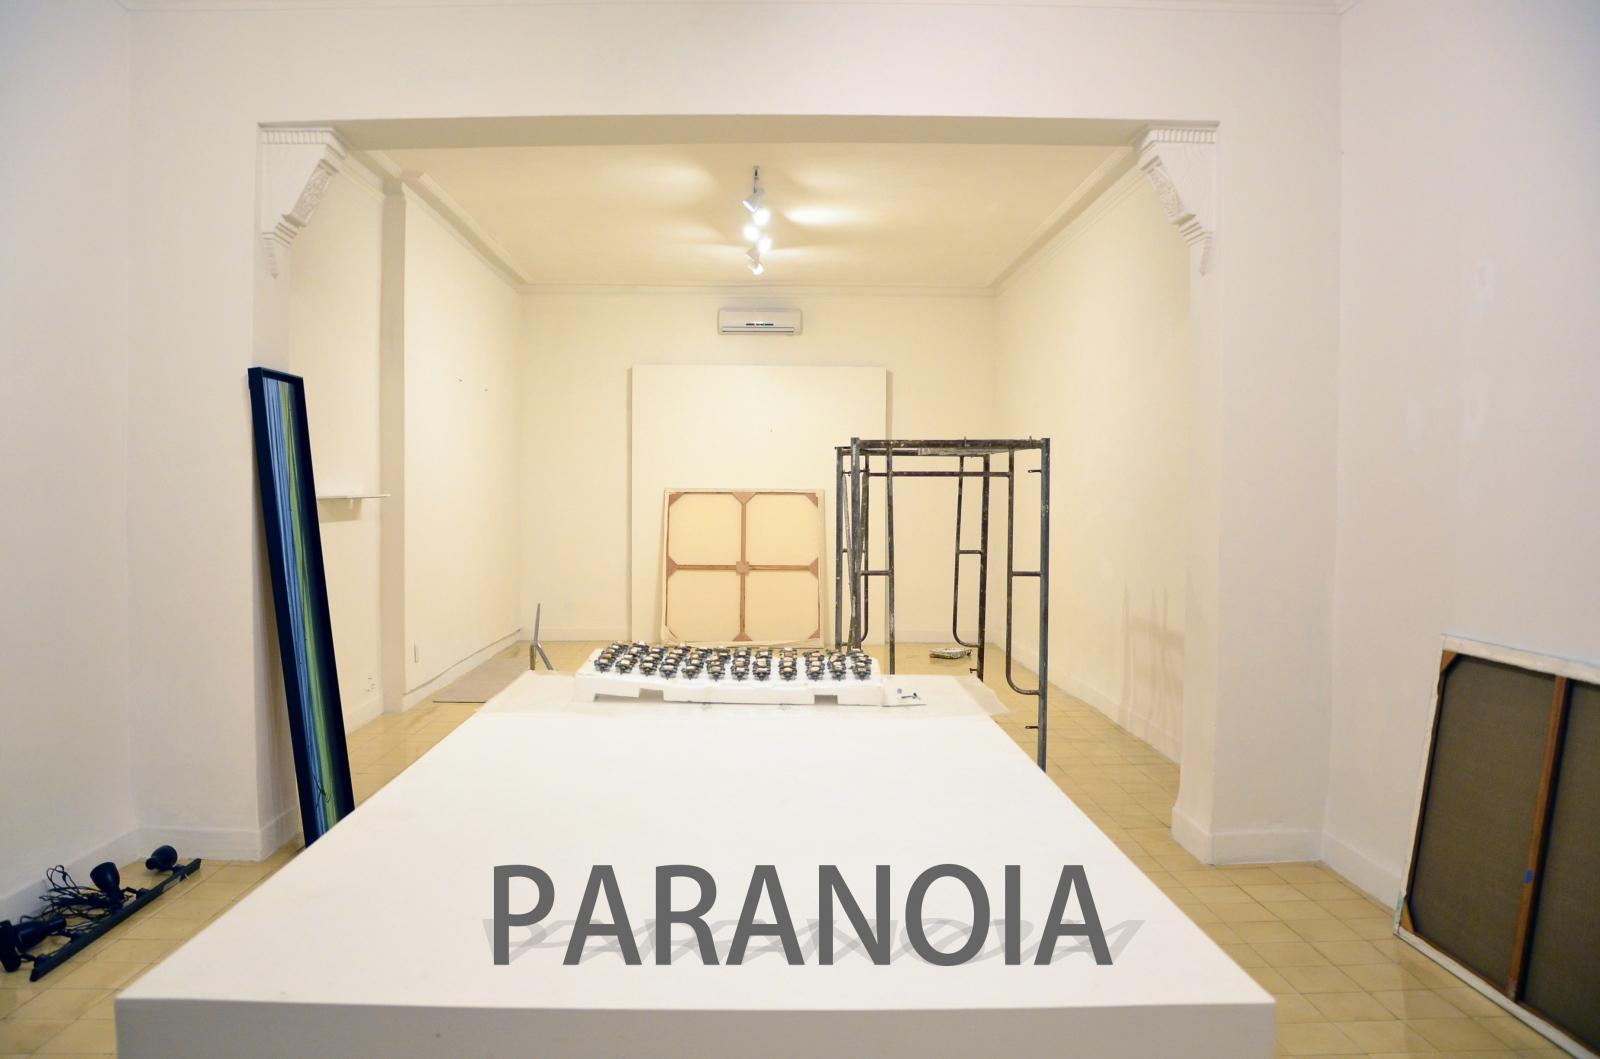 Photography image - Loading Paranoia.jpg